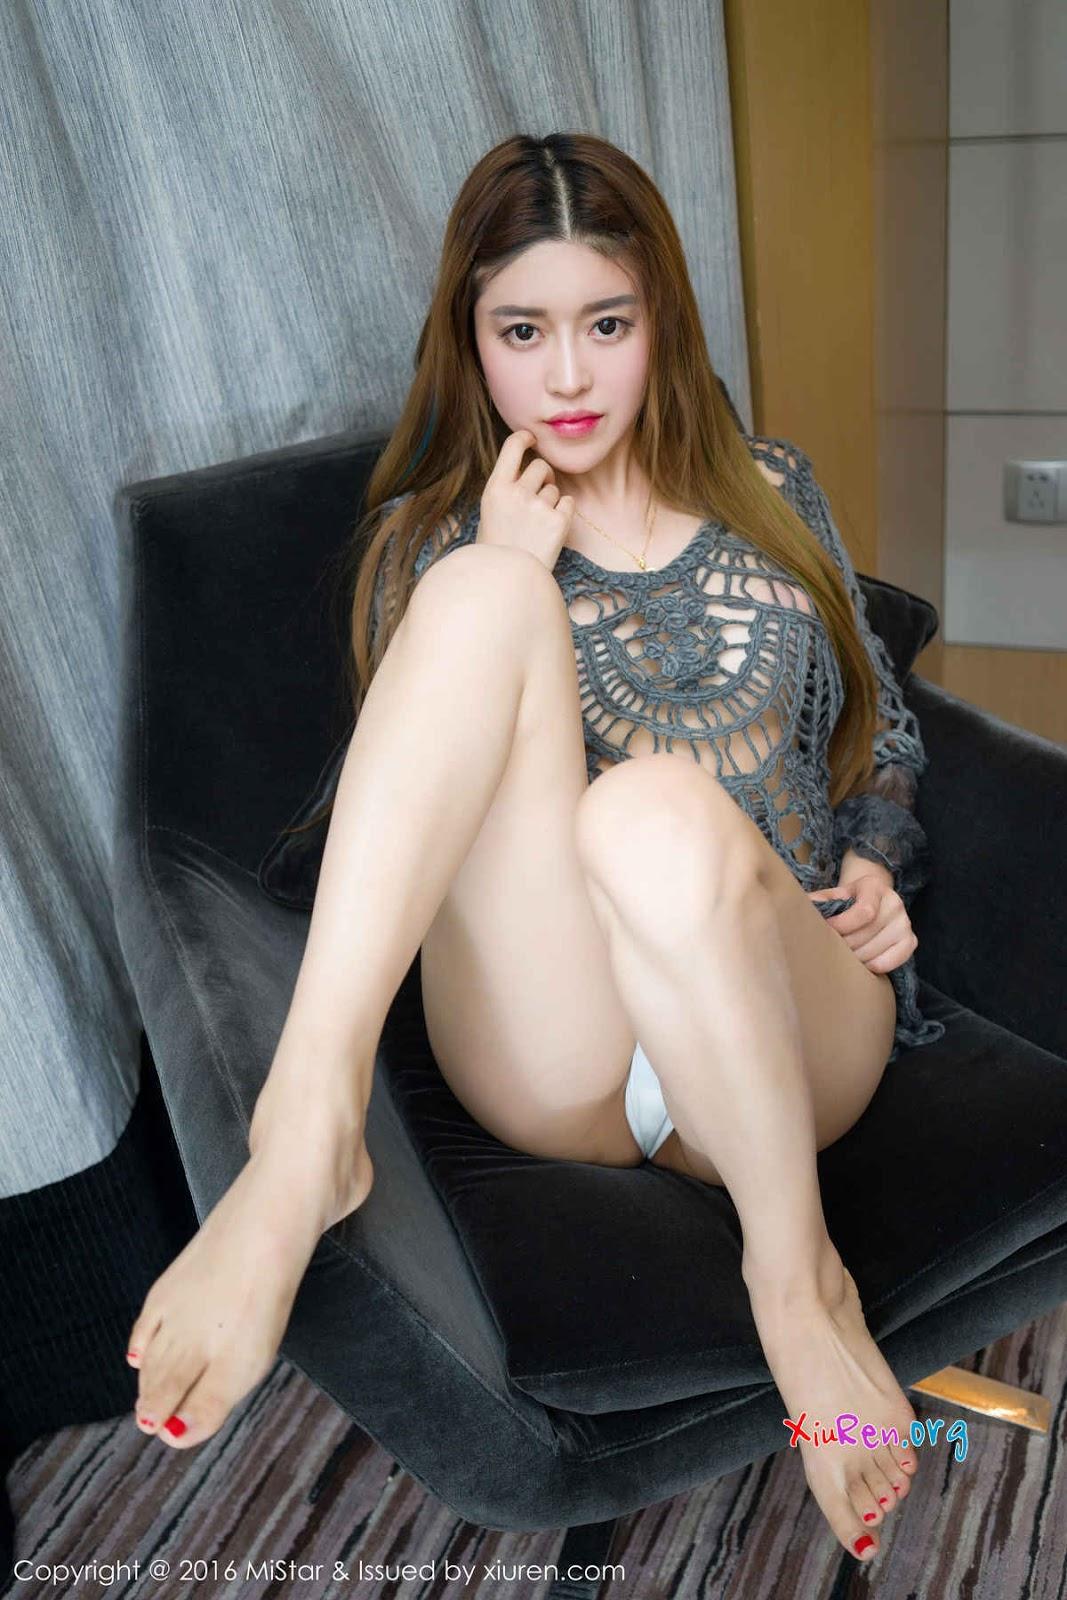 https://4.bp.blogspot.com/-aOvsy9ZrHGs/WHr0C0N7S2I/AAAAAAAAO10/bOY0vmGwNuoyv0KdhRSm60ZLHMaSc3CVgCLcB/s1600/xinh-sexy-9.jpg